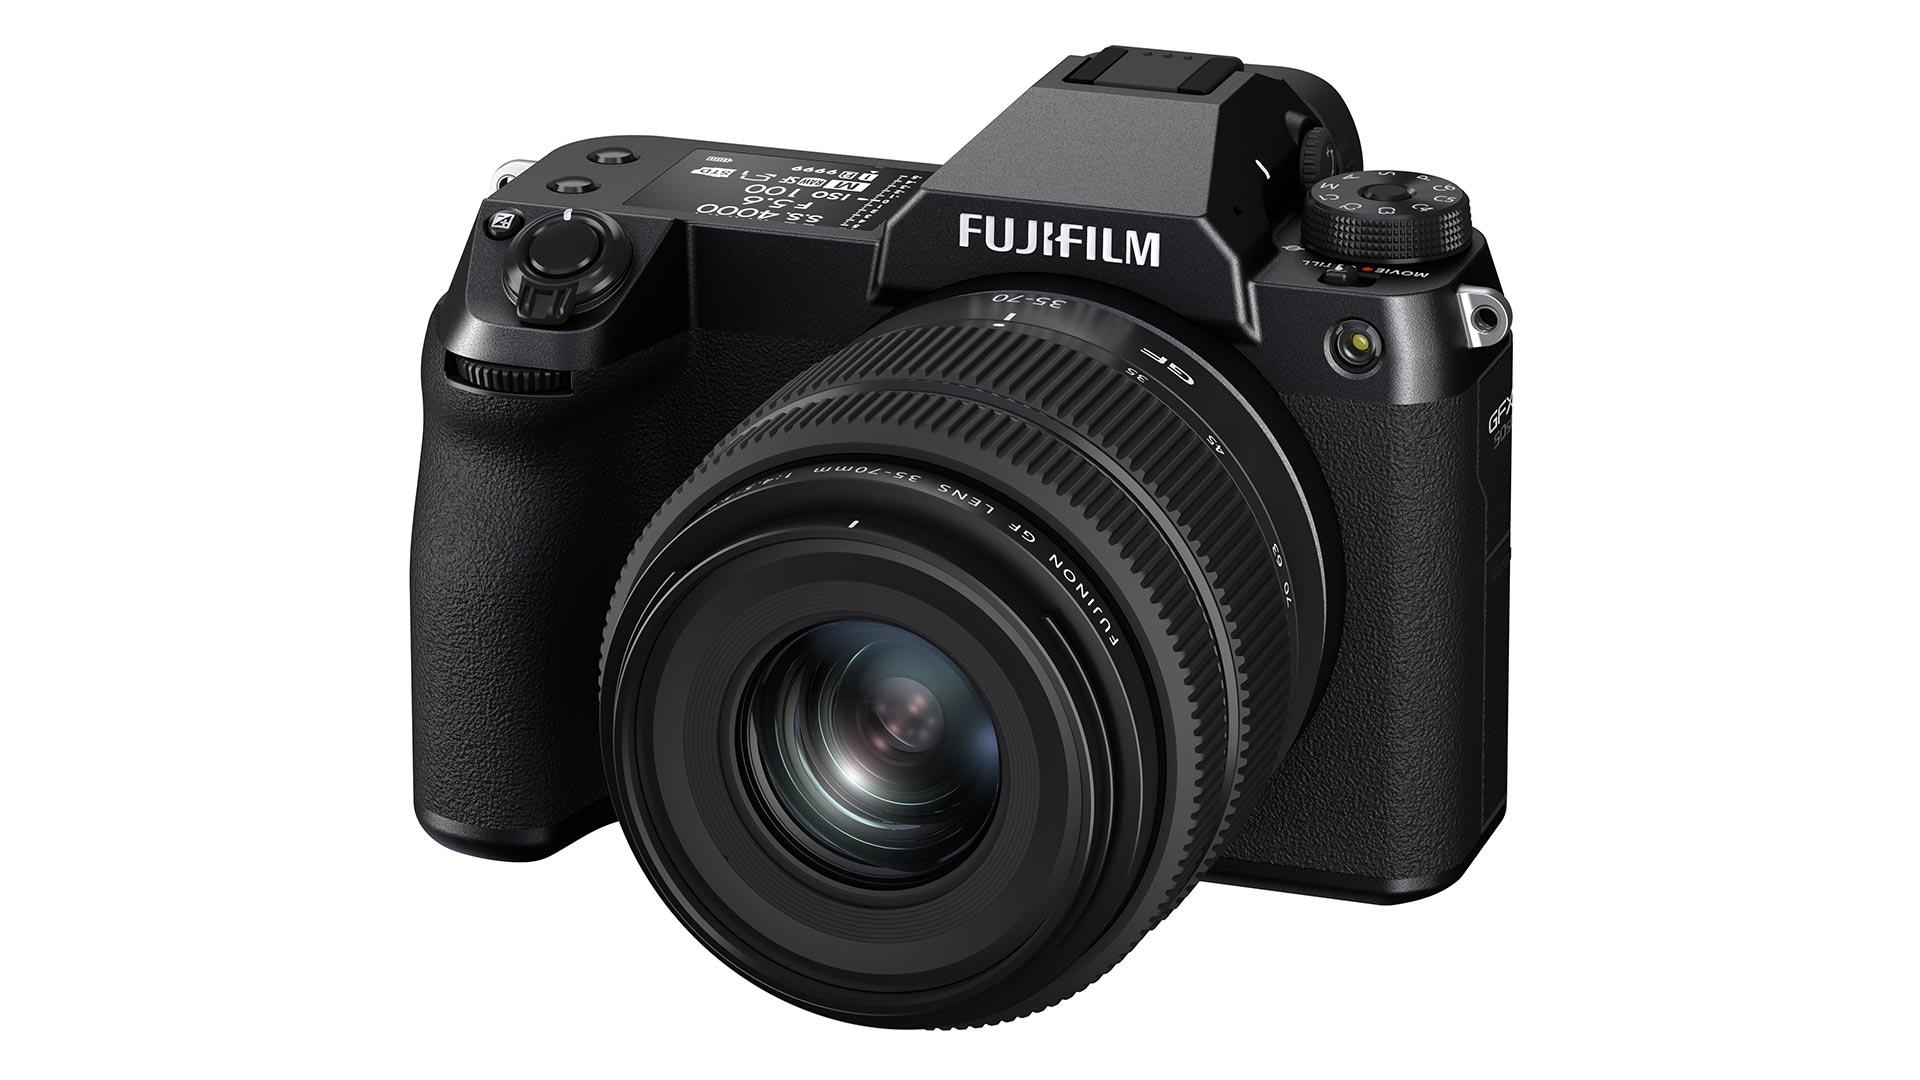 The new Fujifilm GFX 50S II. Image: Fujifilm.